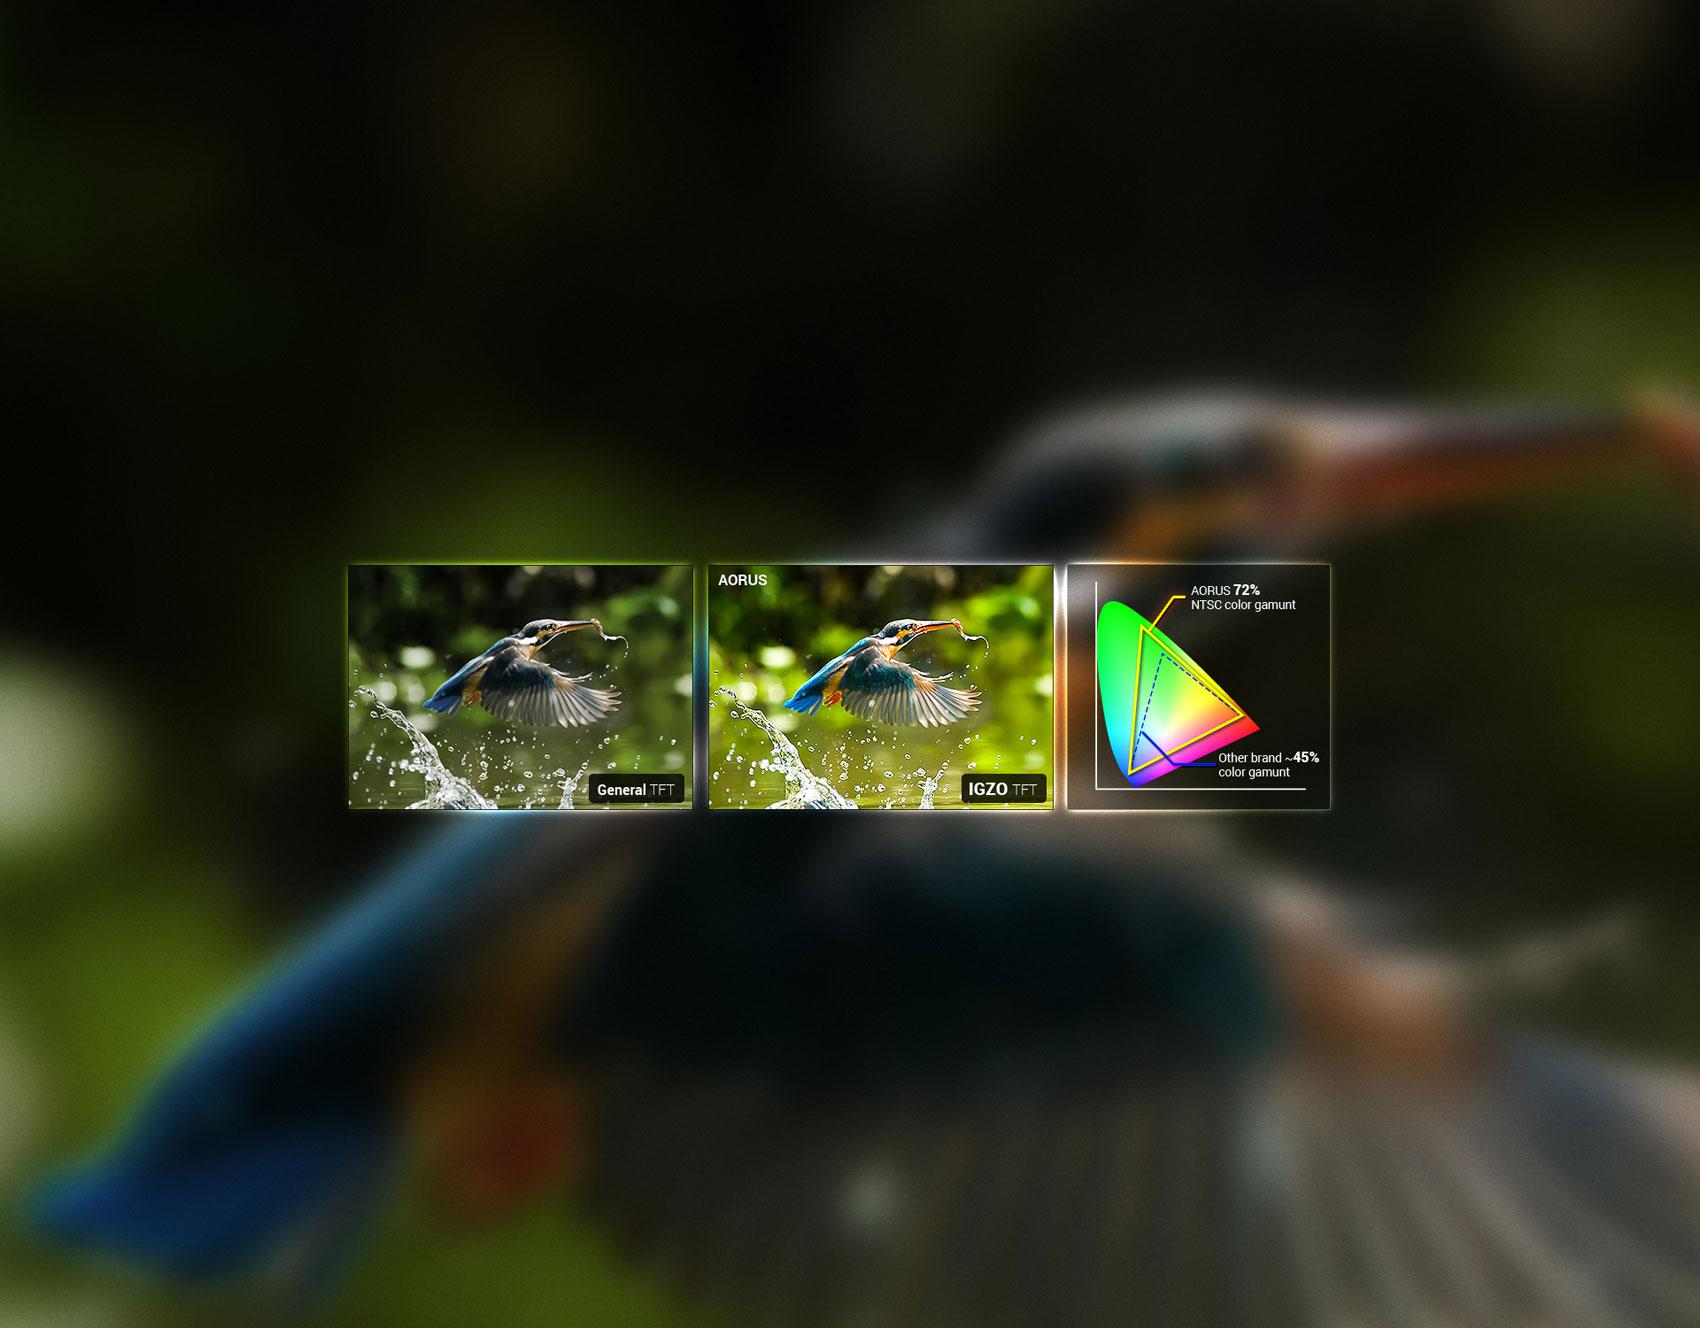 https://www.aorus.com/product_html/120/X3Plusv7/images/IGZO-bg-1700.jpg